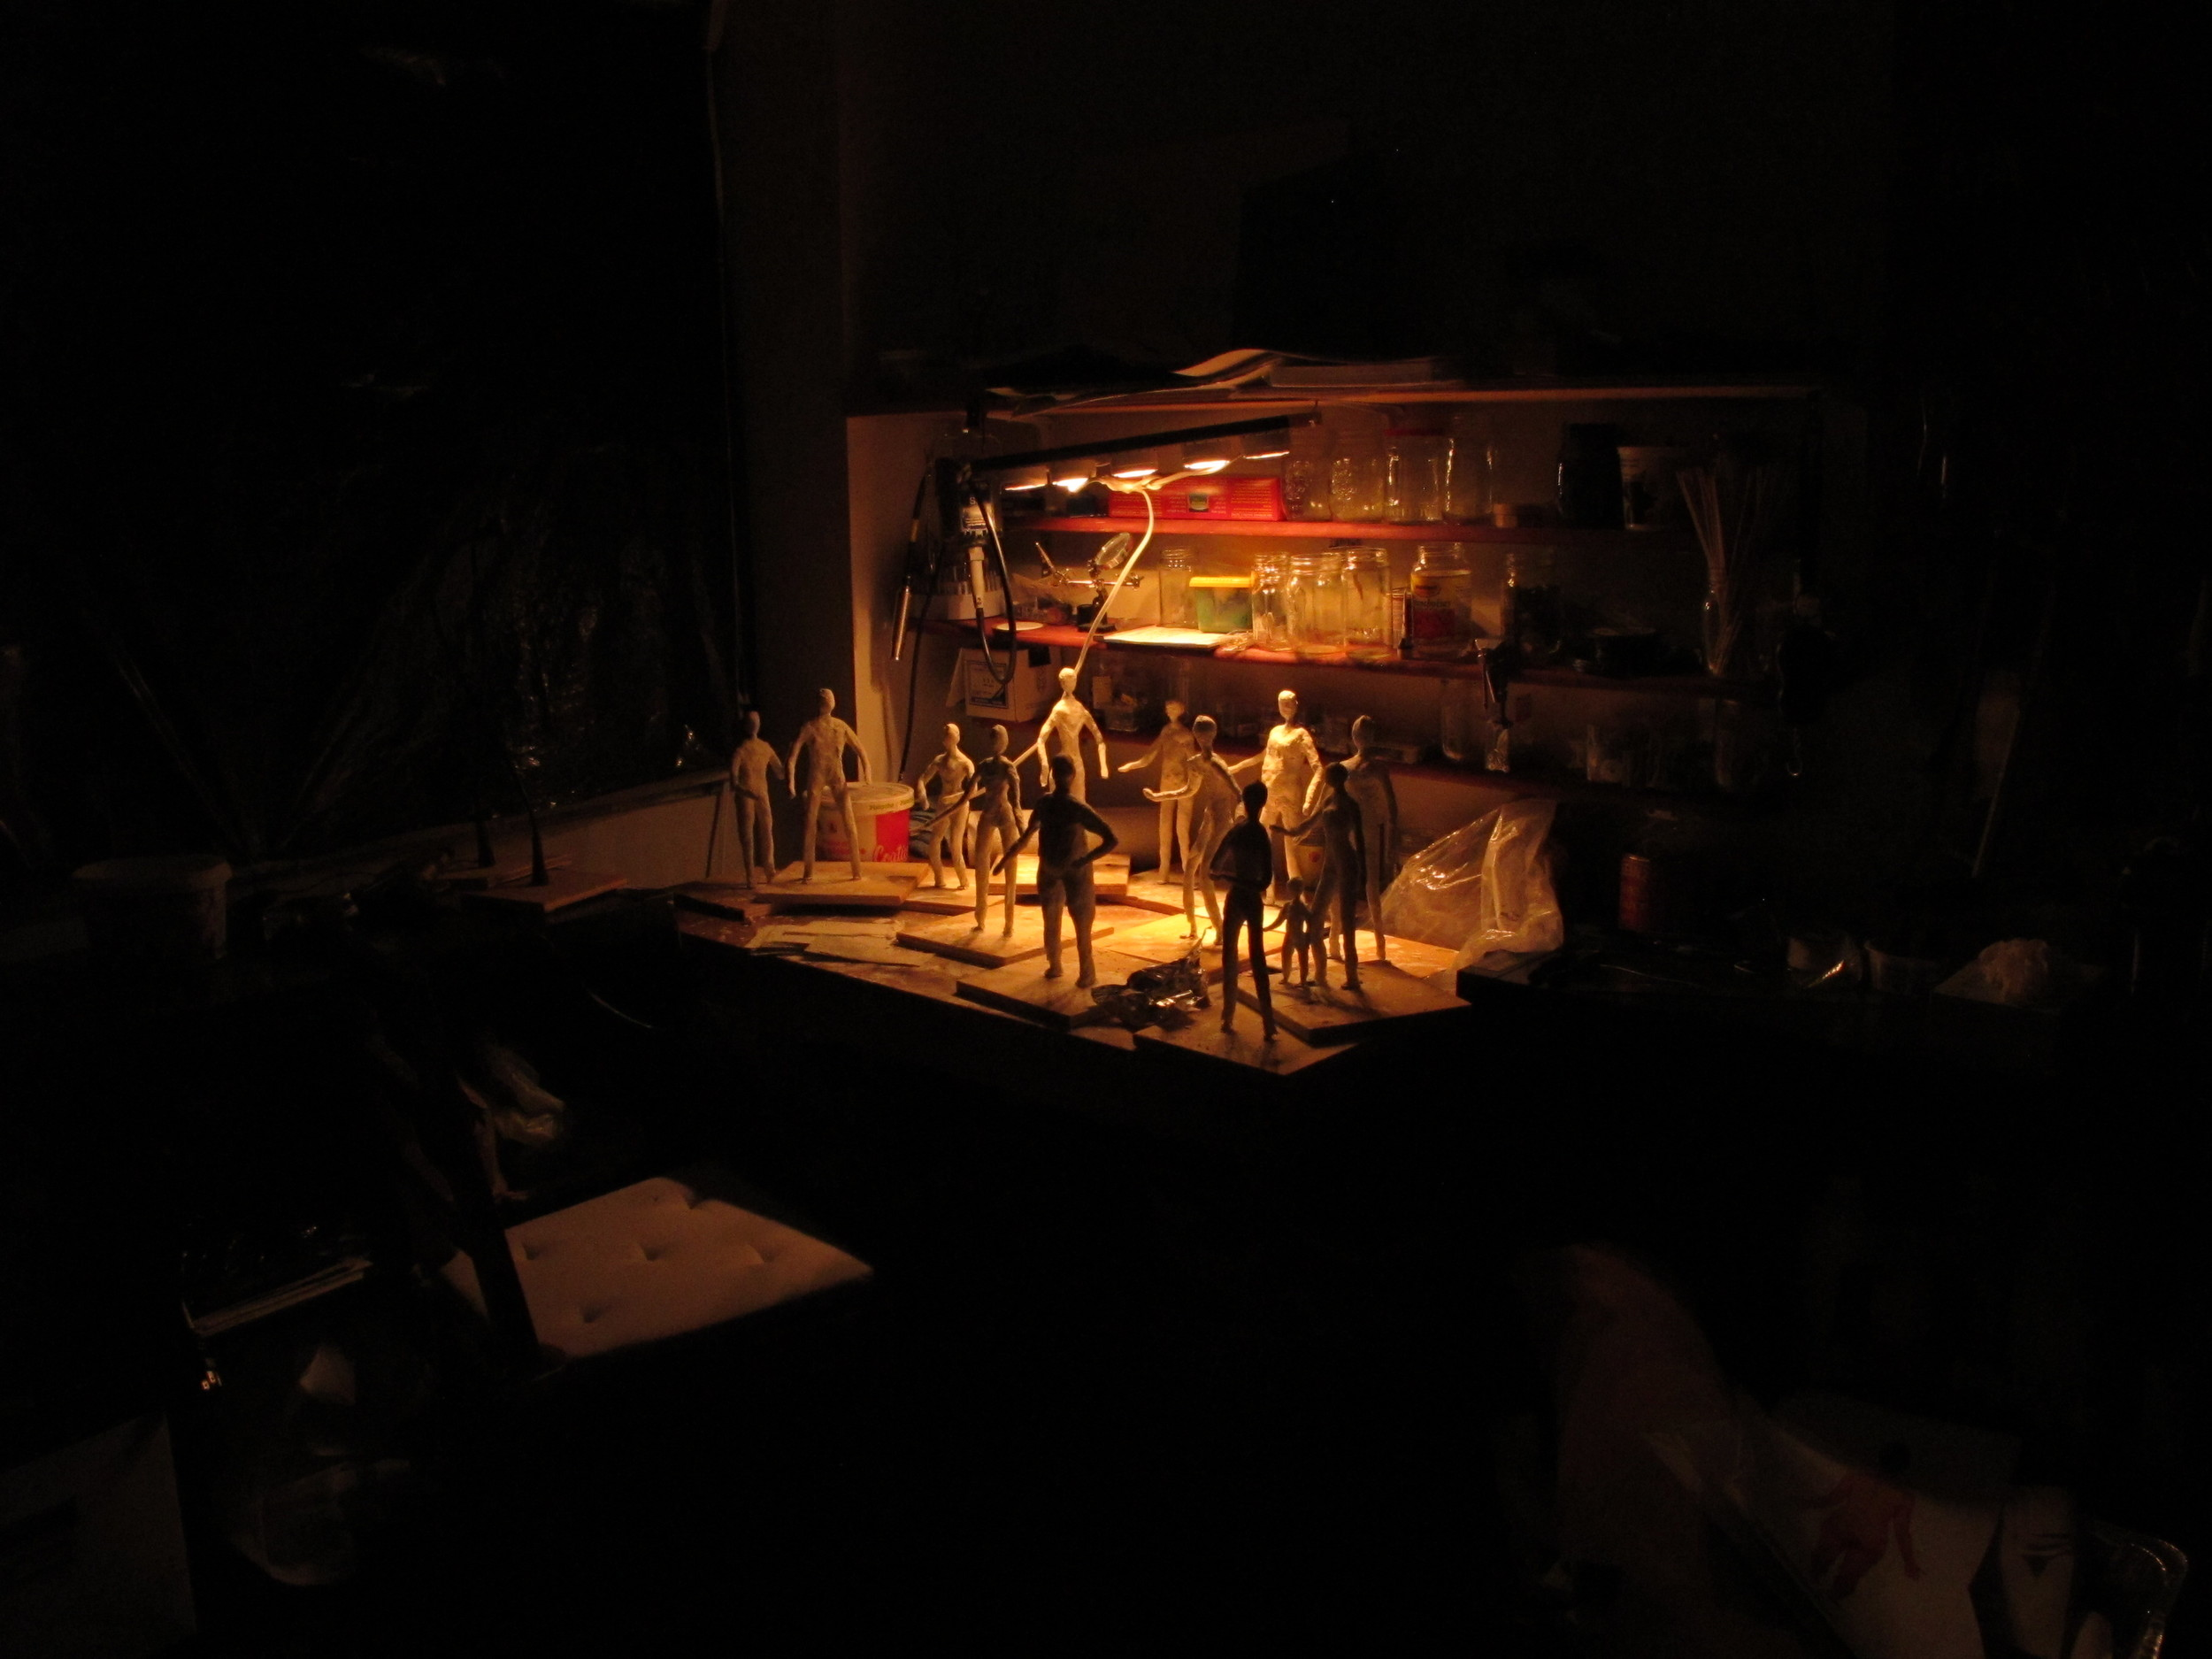 Studio shot c.2012